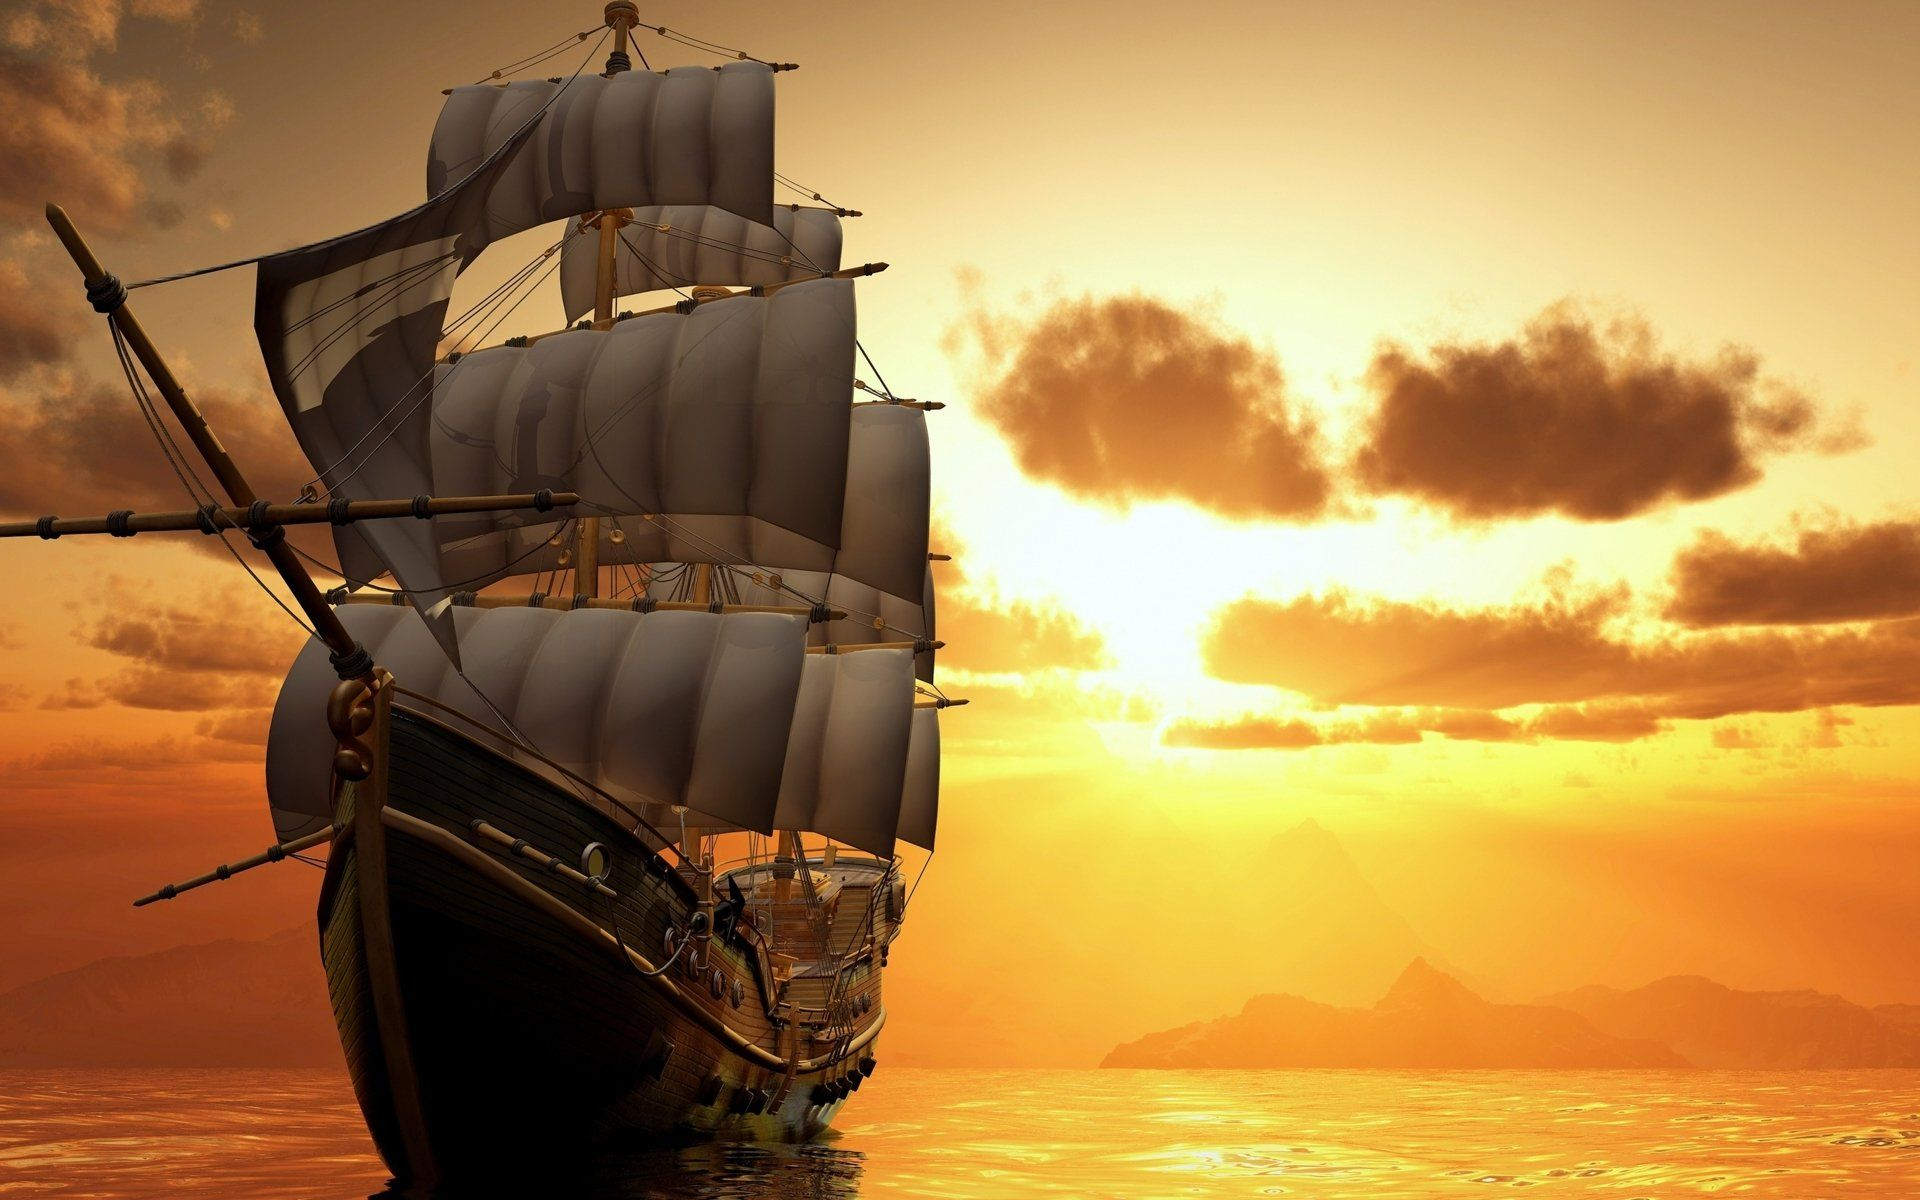 Vehicles Sailing Ship Cloud Landscape Ocean Sea Sunset Sailboat Wallpaper In 2020 Sailing Sailing Ships Sea And Ocean